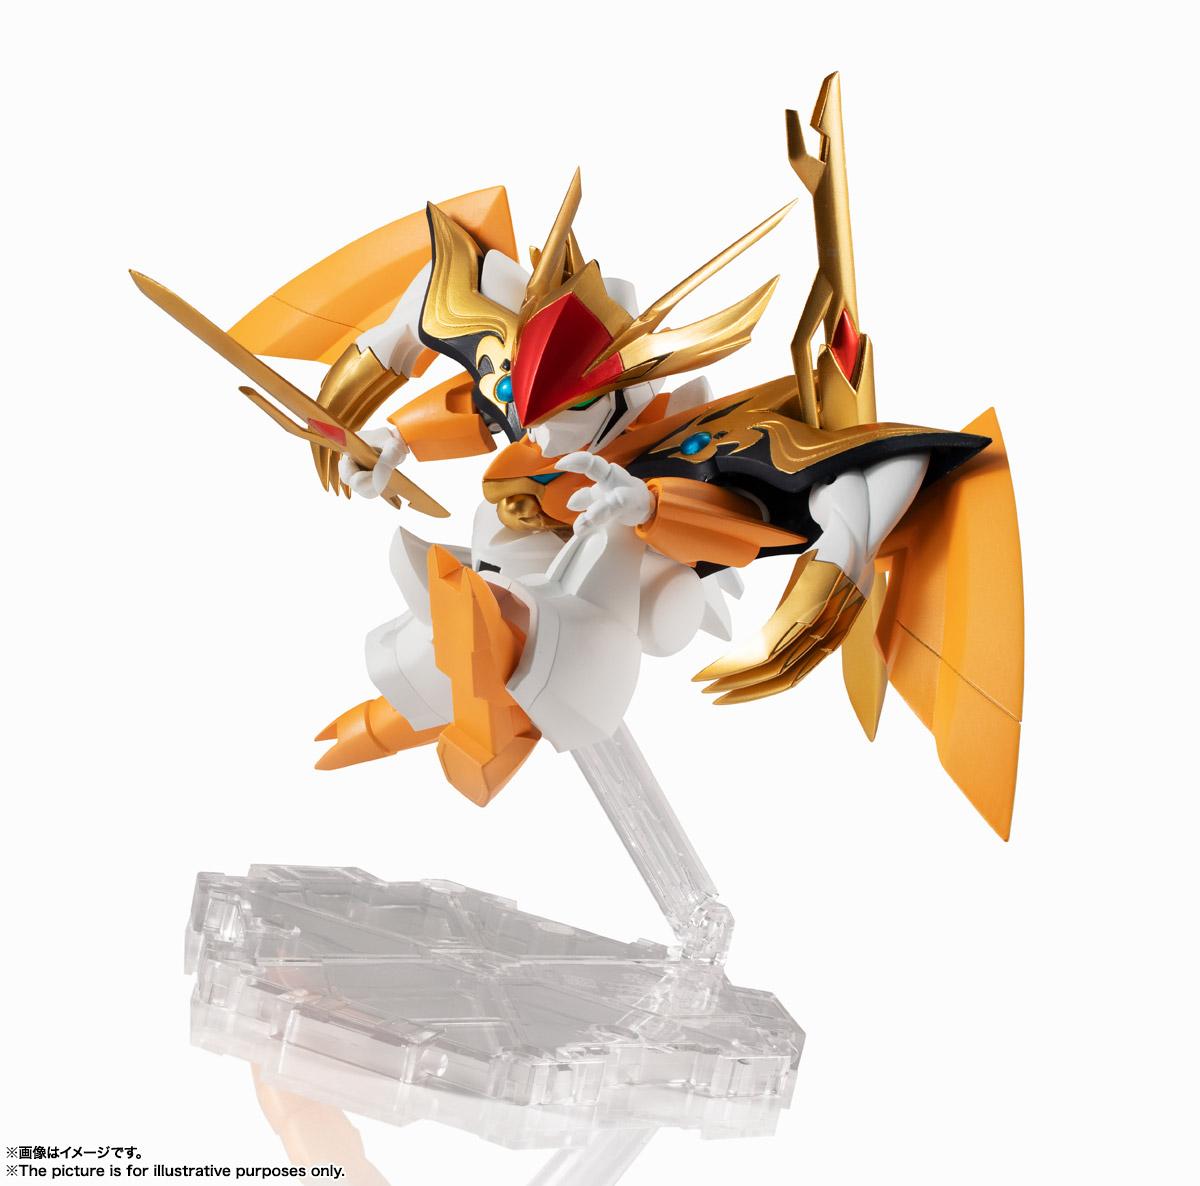 NXEDGE STYLE[MASHIN UNIT]『龍激丸』魔神英雄伝ワタル 可動フィギュア-003